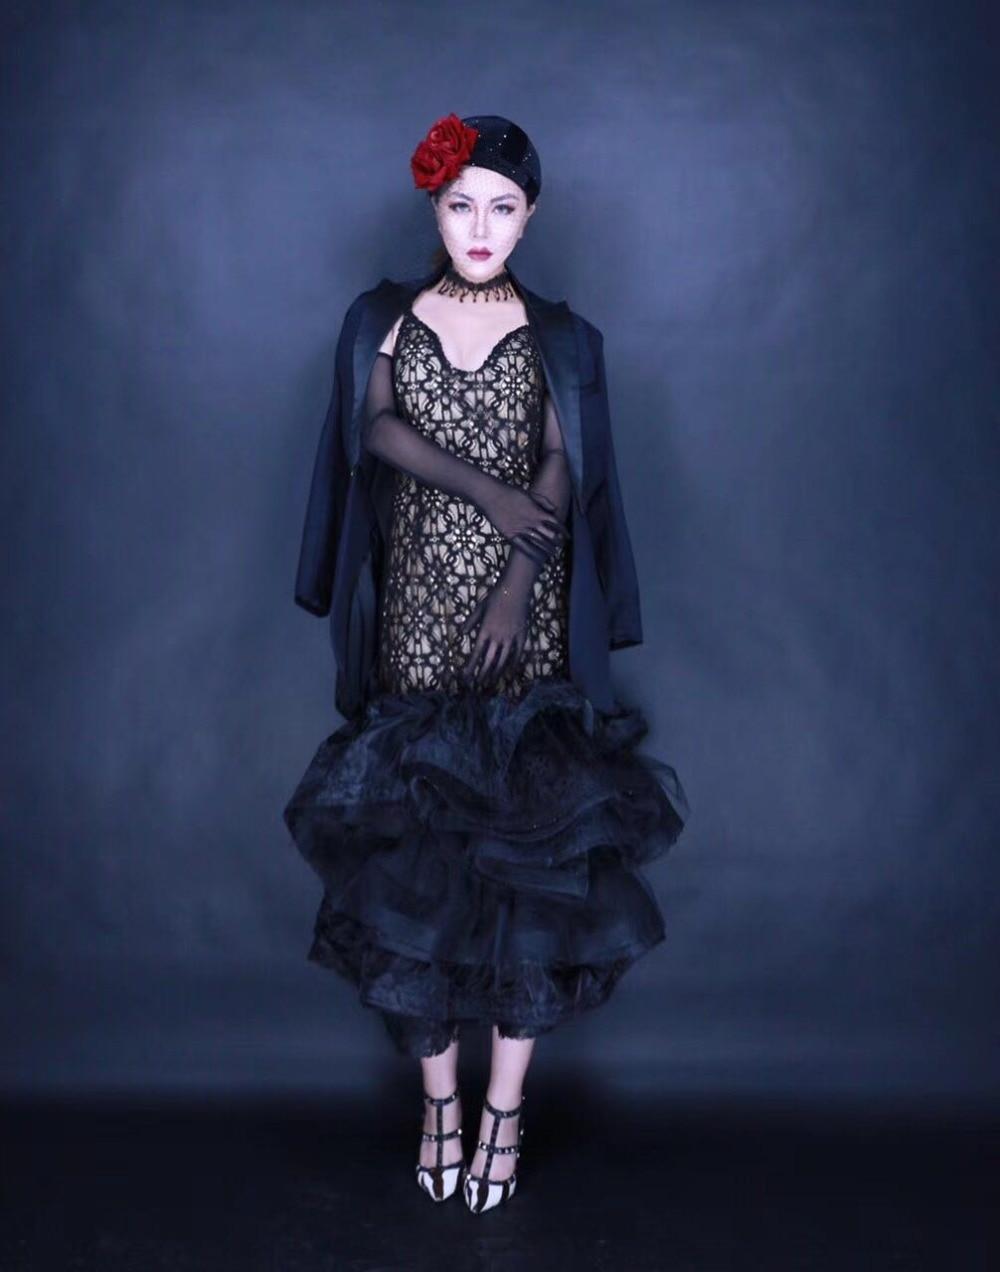 Qian Han Zi Autumn Winter Runway Suit sets Women Long Sleeve Hooded Sweater Top Pattern Print